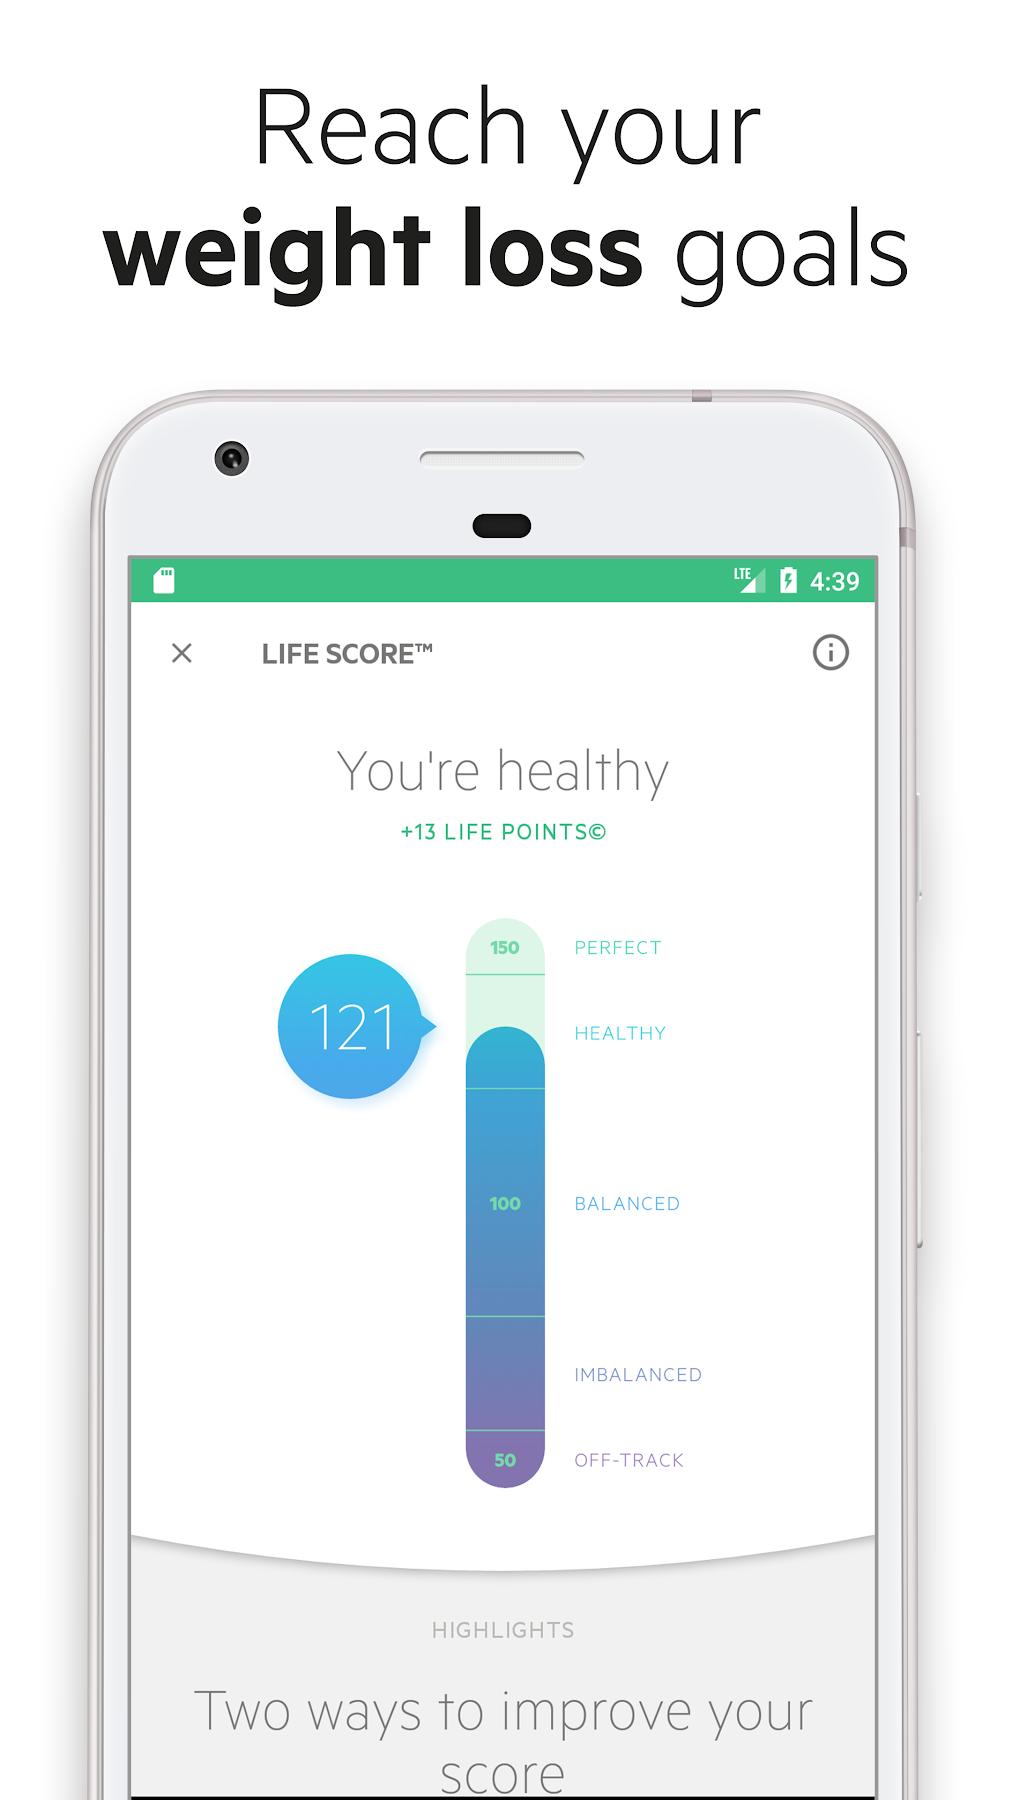 Kuvakaappaus Inspiration app, Nutrition app, Tracking app